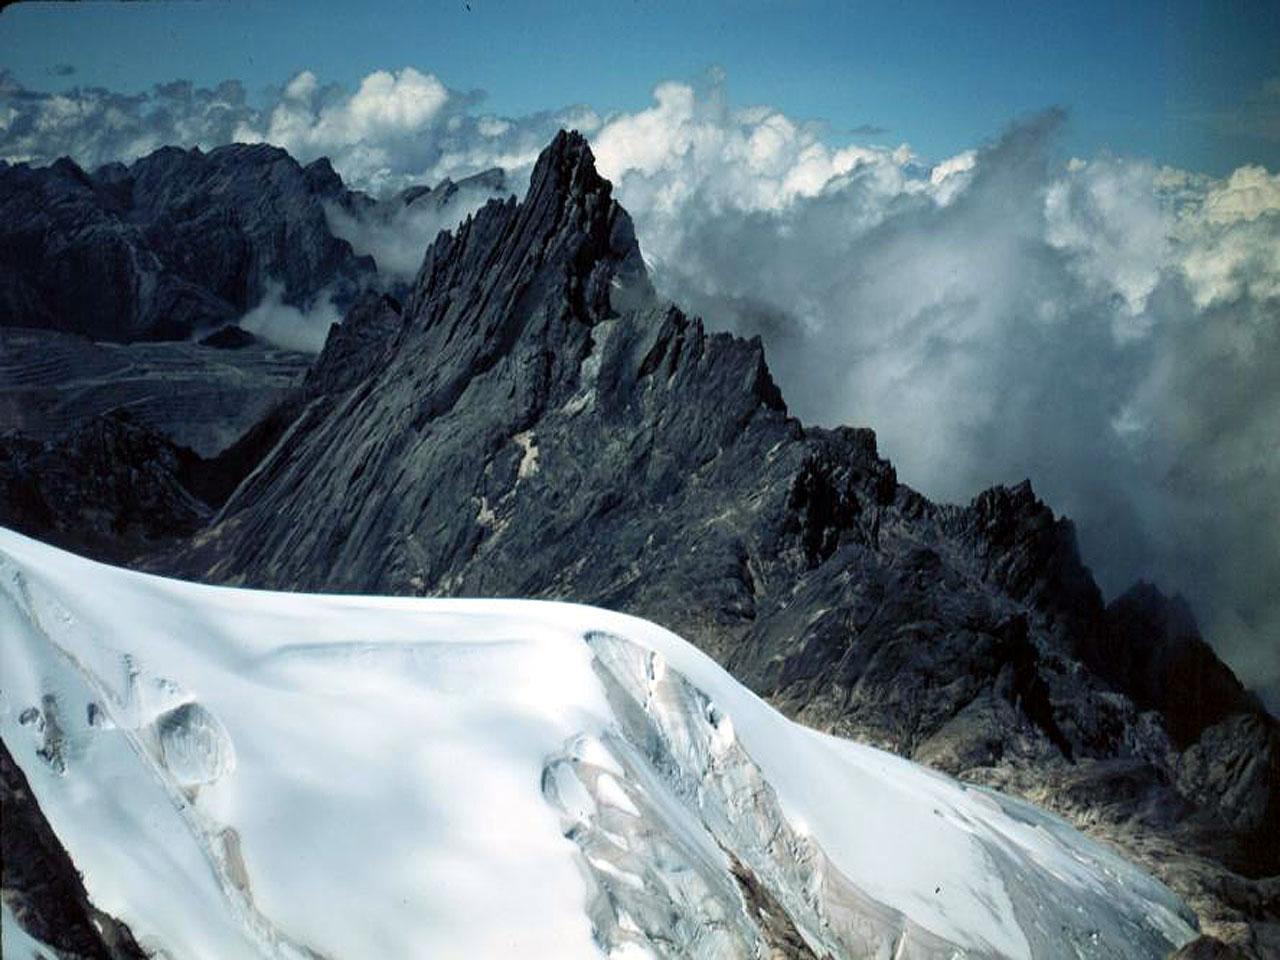 http://www.indonesiaindonesia.com/imagehosting/images/19019/1_muller-glacier-1280-960.jpg